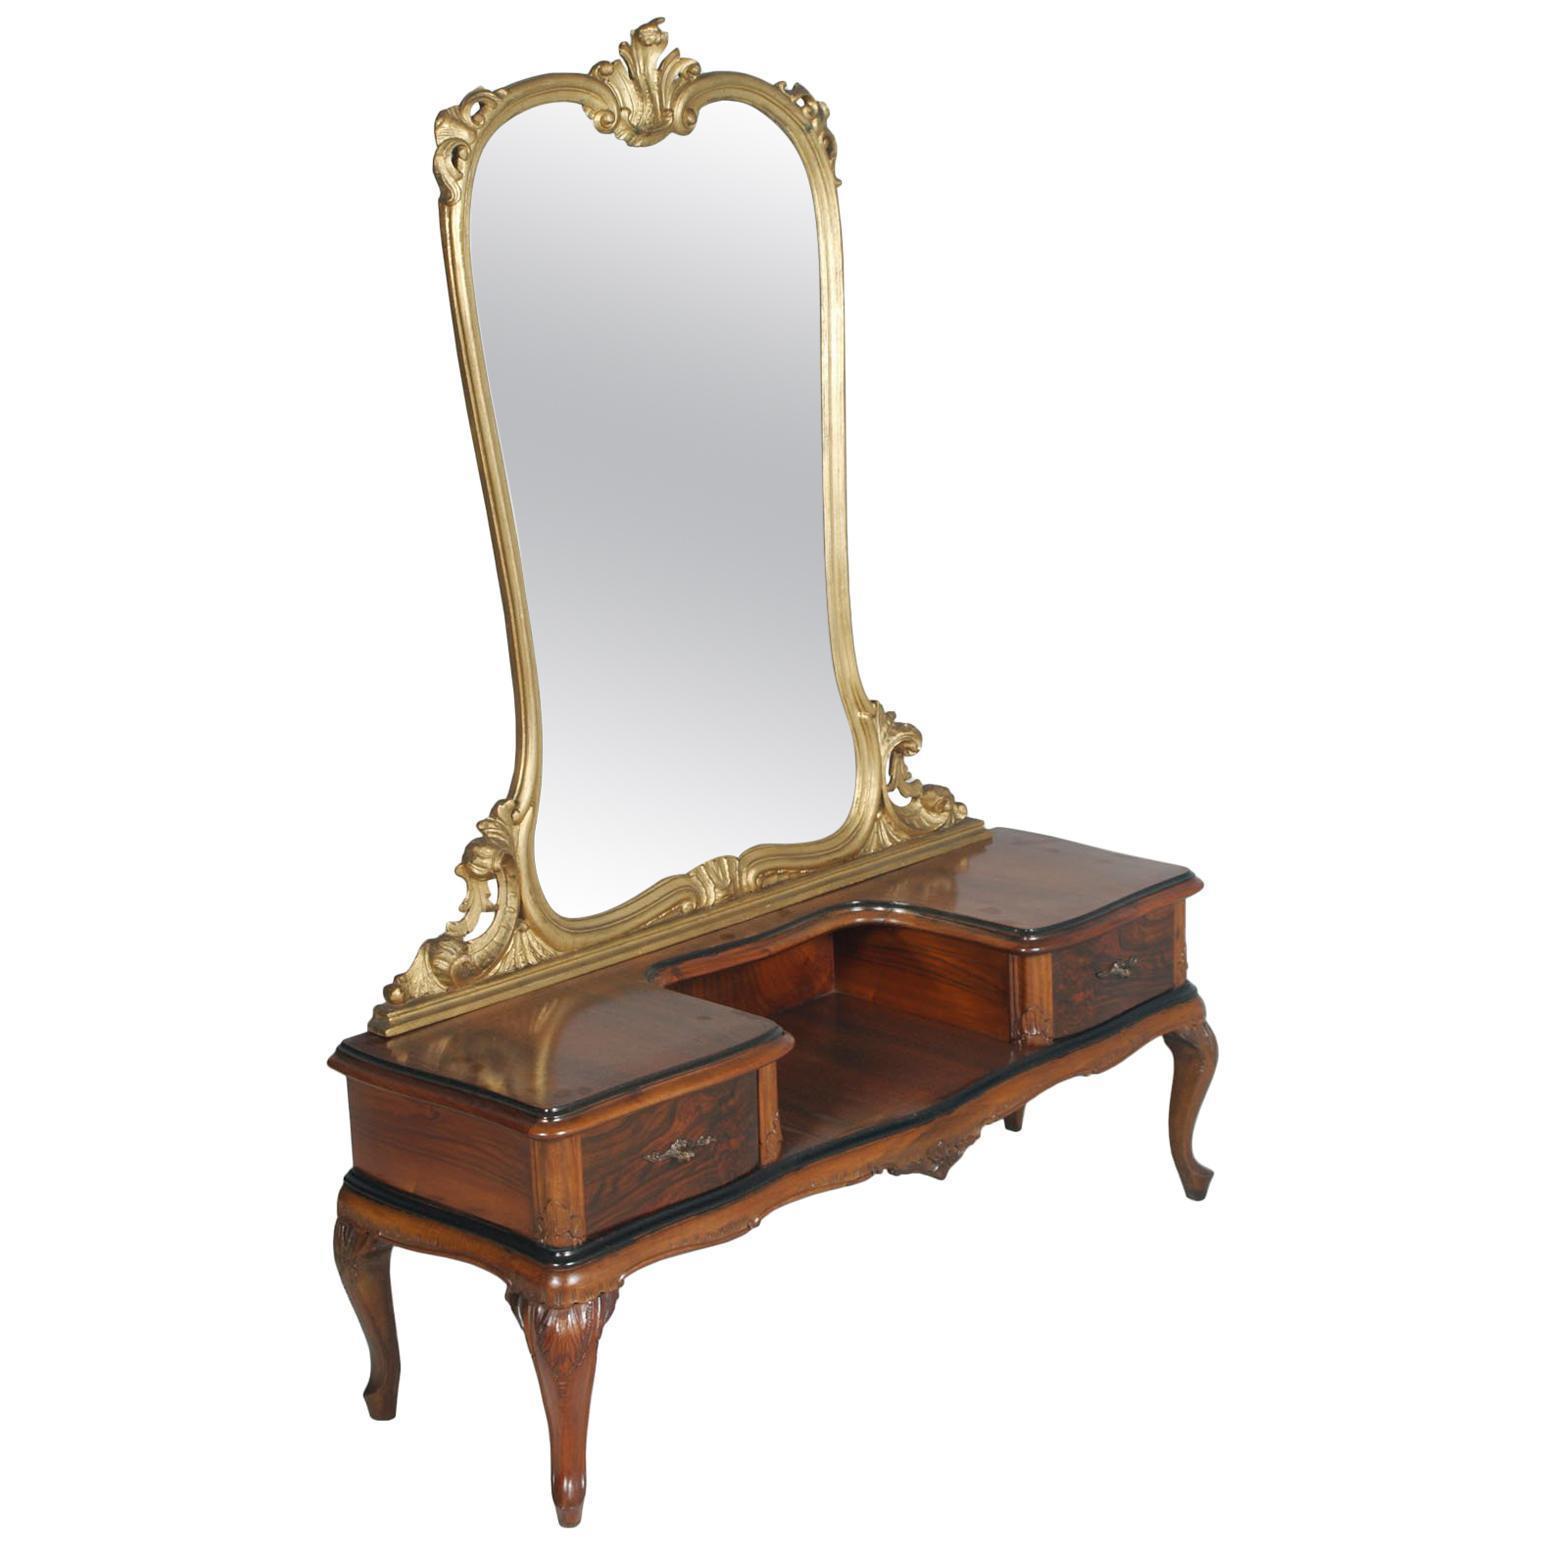 1920s Antique Vanity Baroque Venetian Beveled Mirror Hand Carved Walnut Burl Vinterior